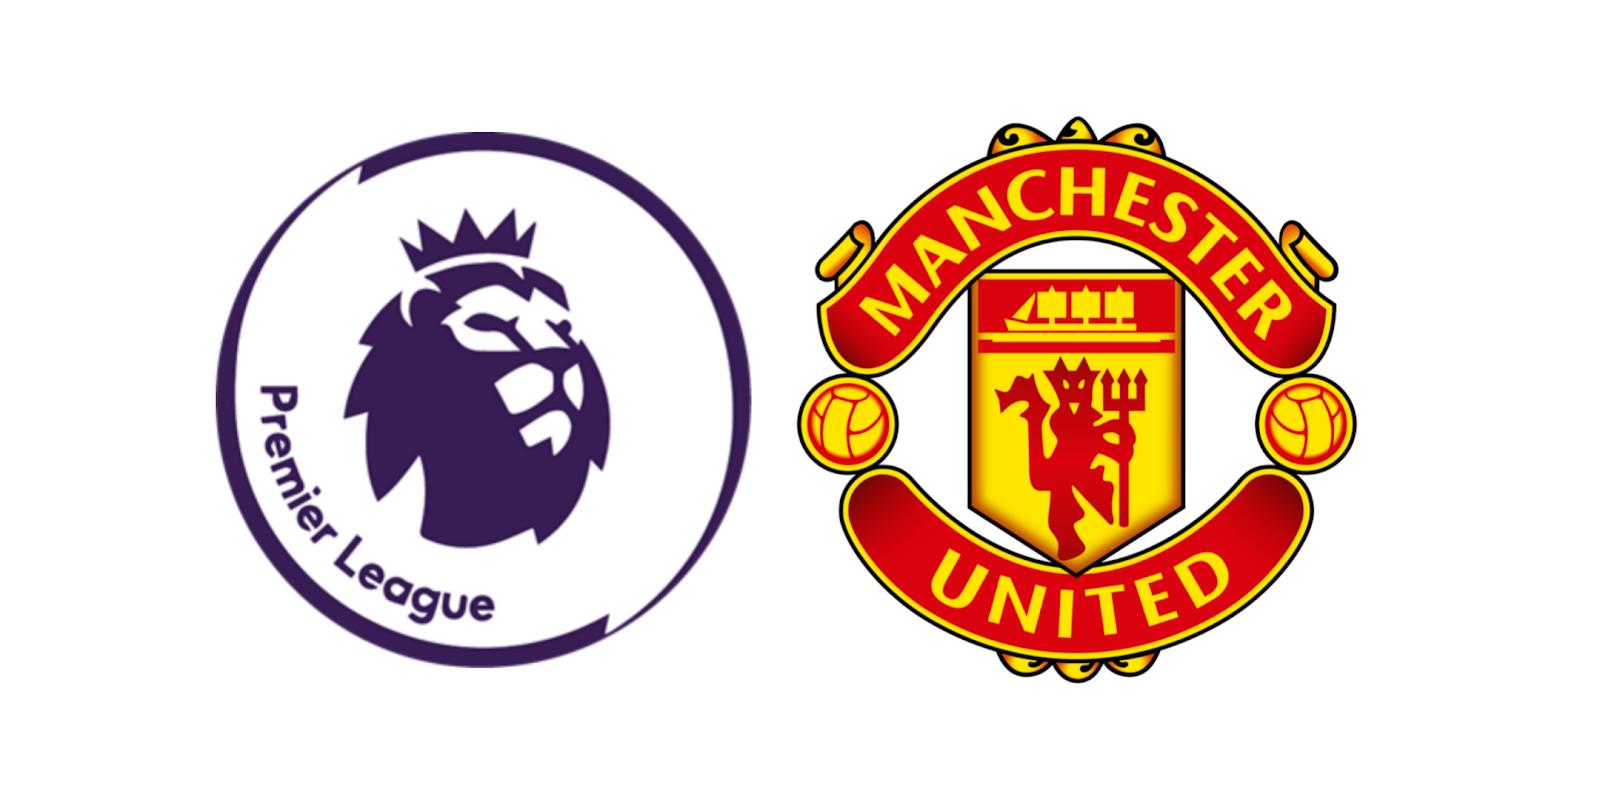 Jadual Perlawanan Manchester United Musim 2019/2020